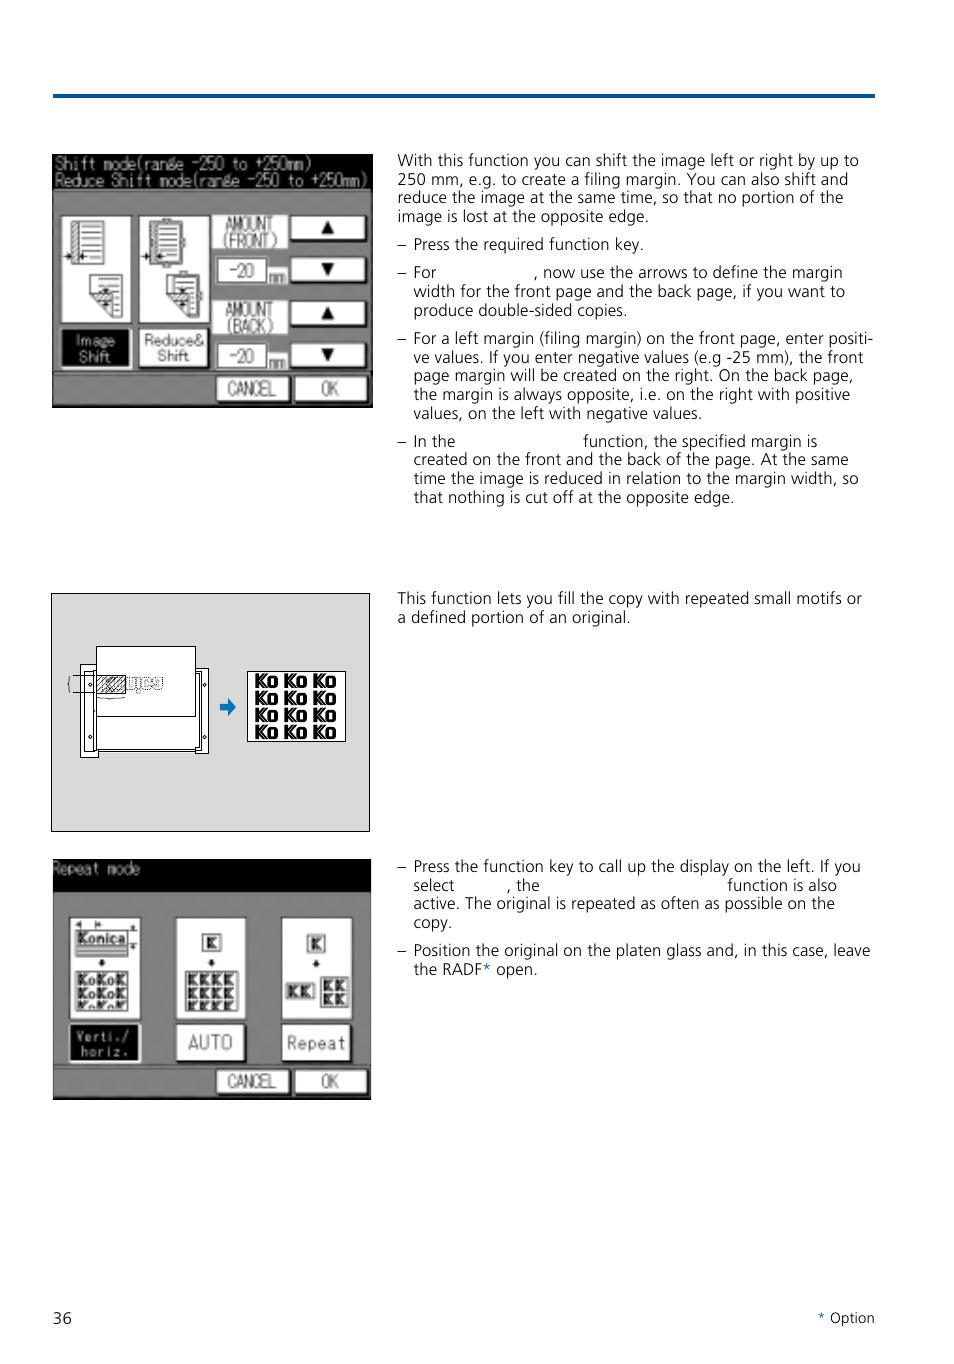 special functions 4 image shift 5 image repeat konica minolta rh manualsdir  com Konica Copier 720 Konica 7020 Printer